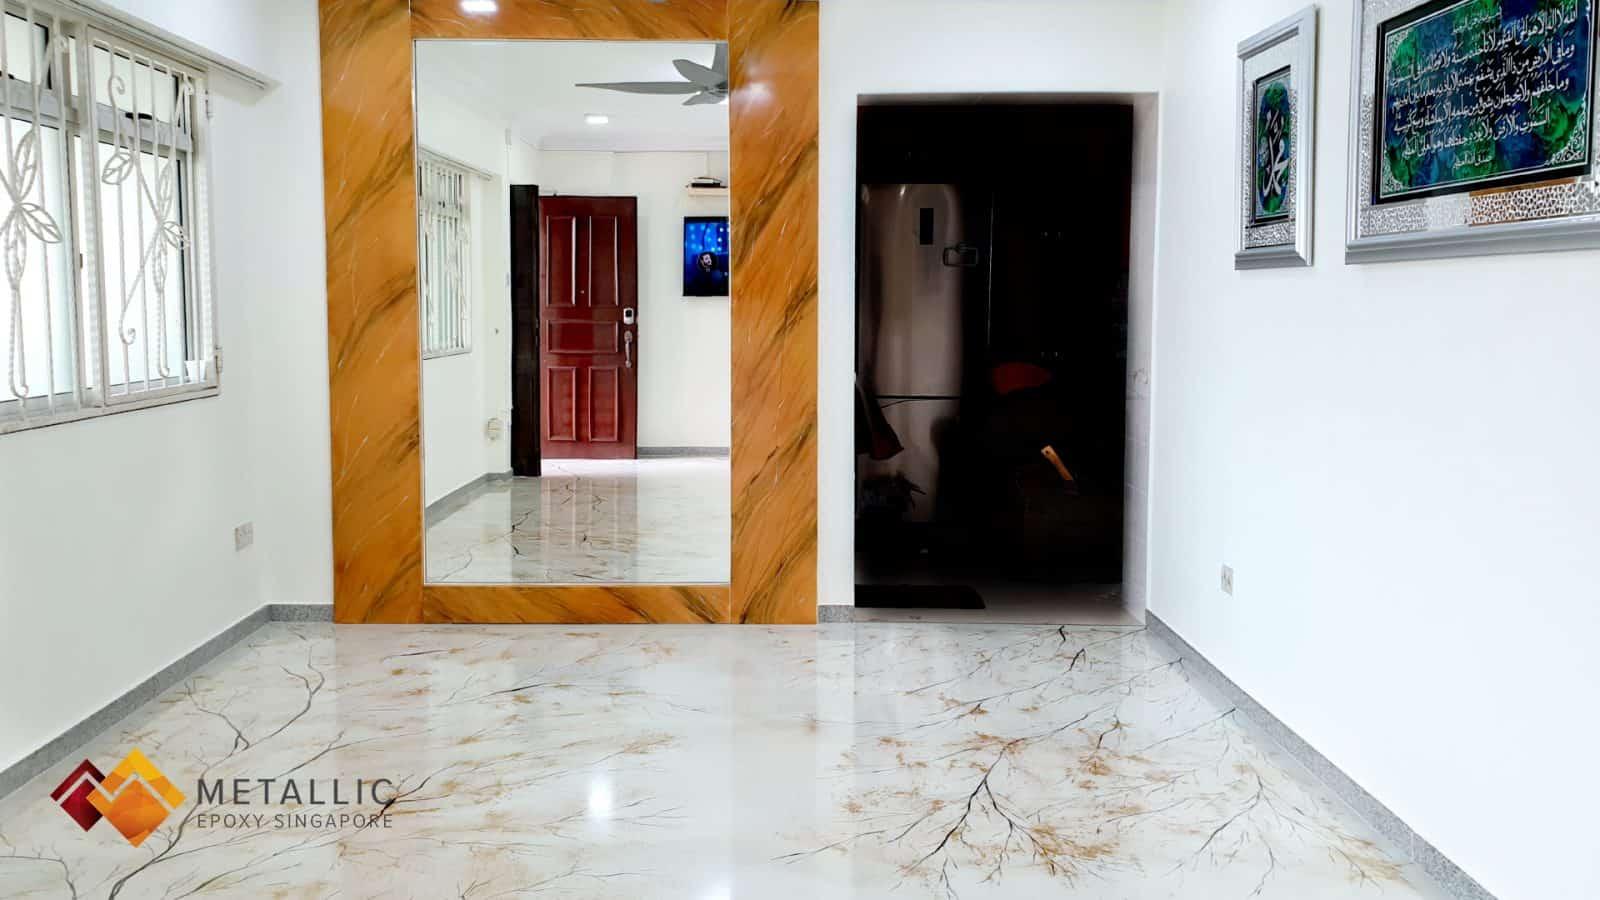 metallic epoxy singapore gold leaf tree living room floor